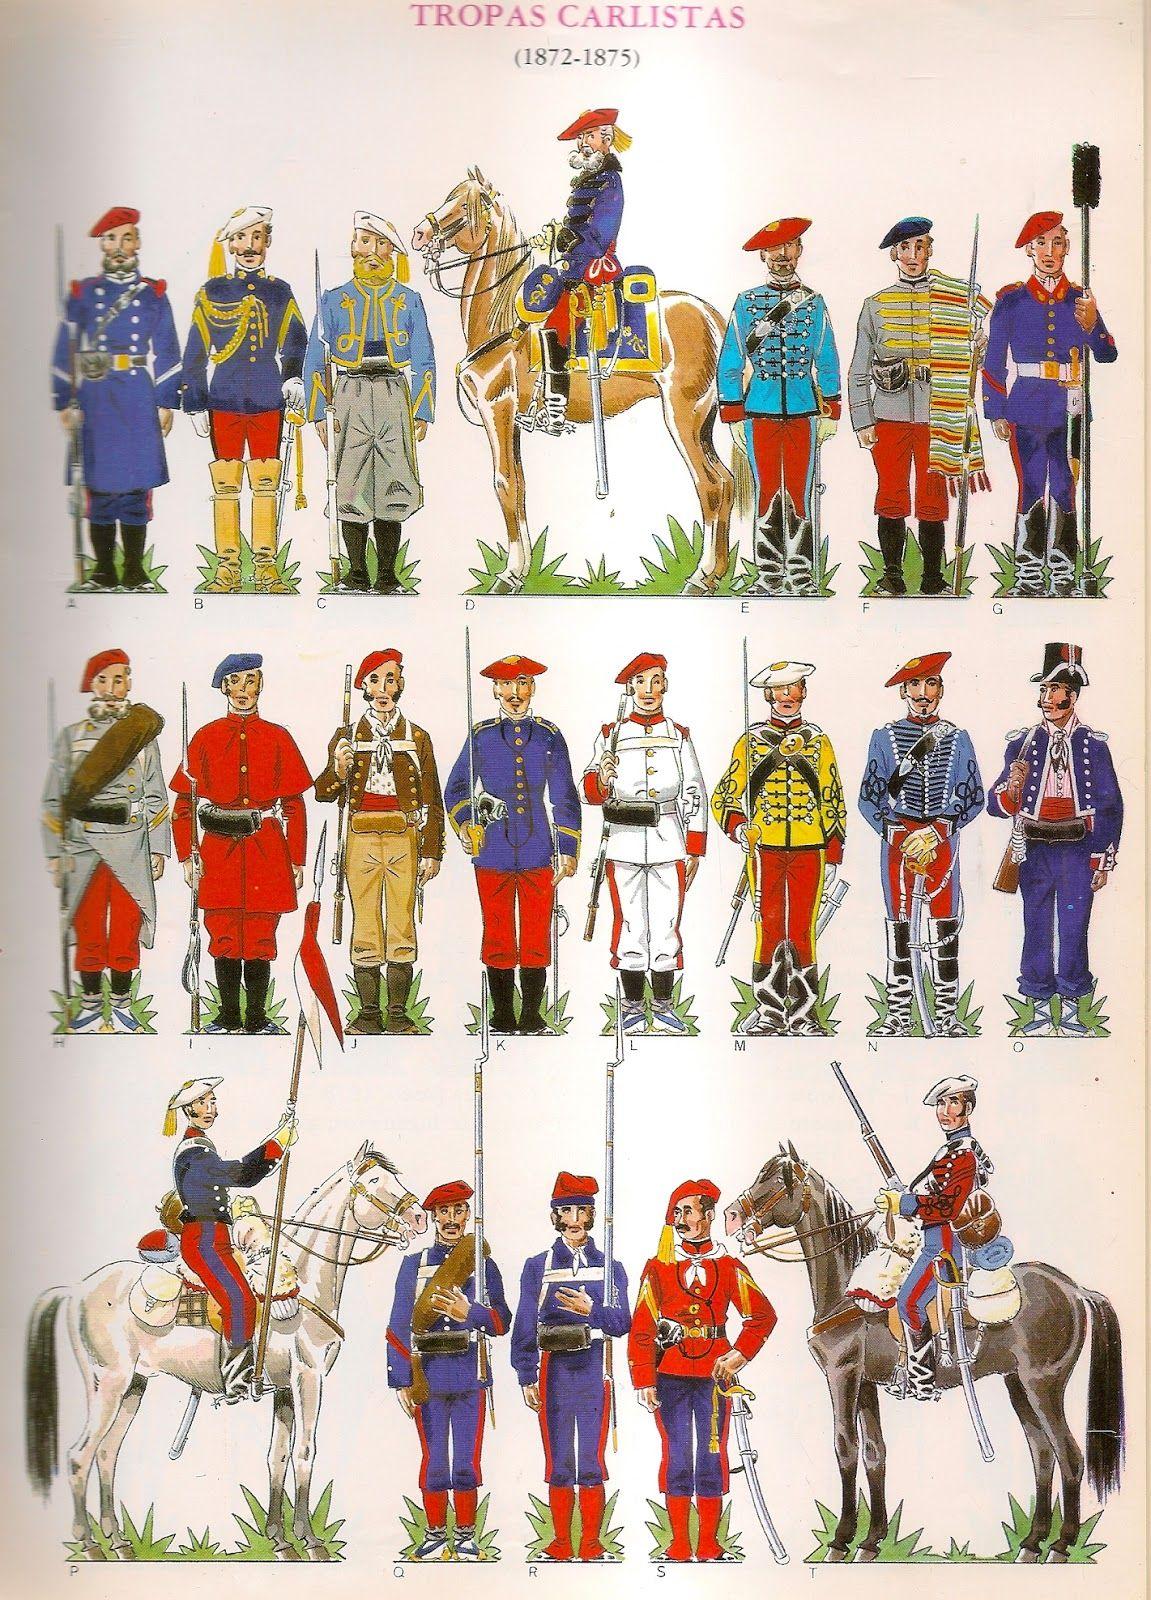 Pin di Alexander Goryn su Carlistes Uniformi militari